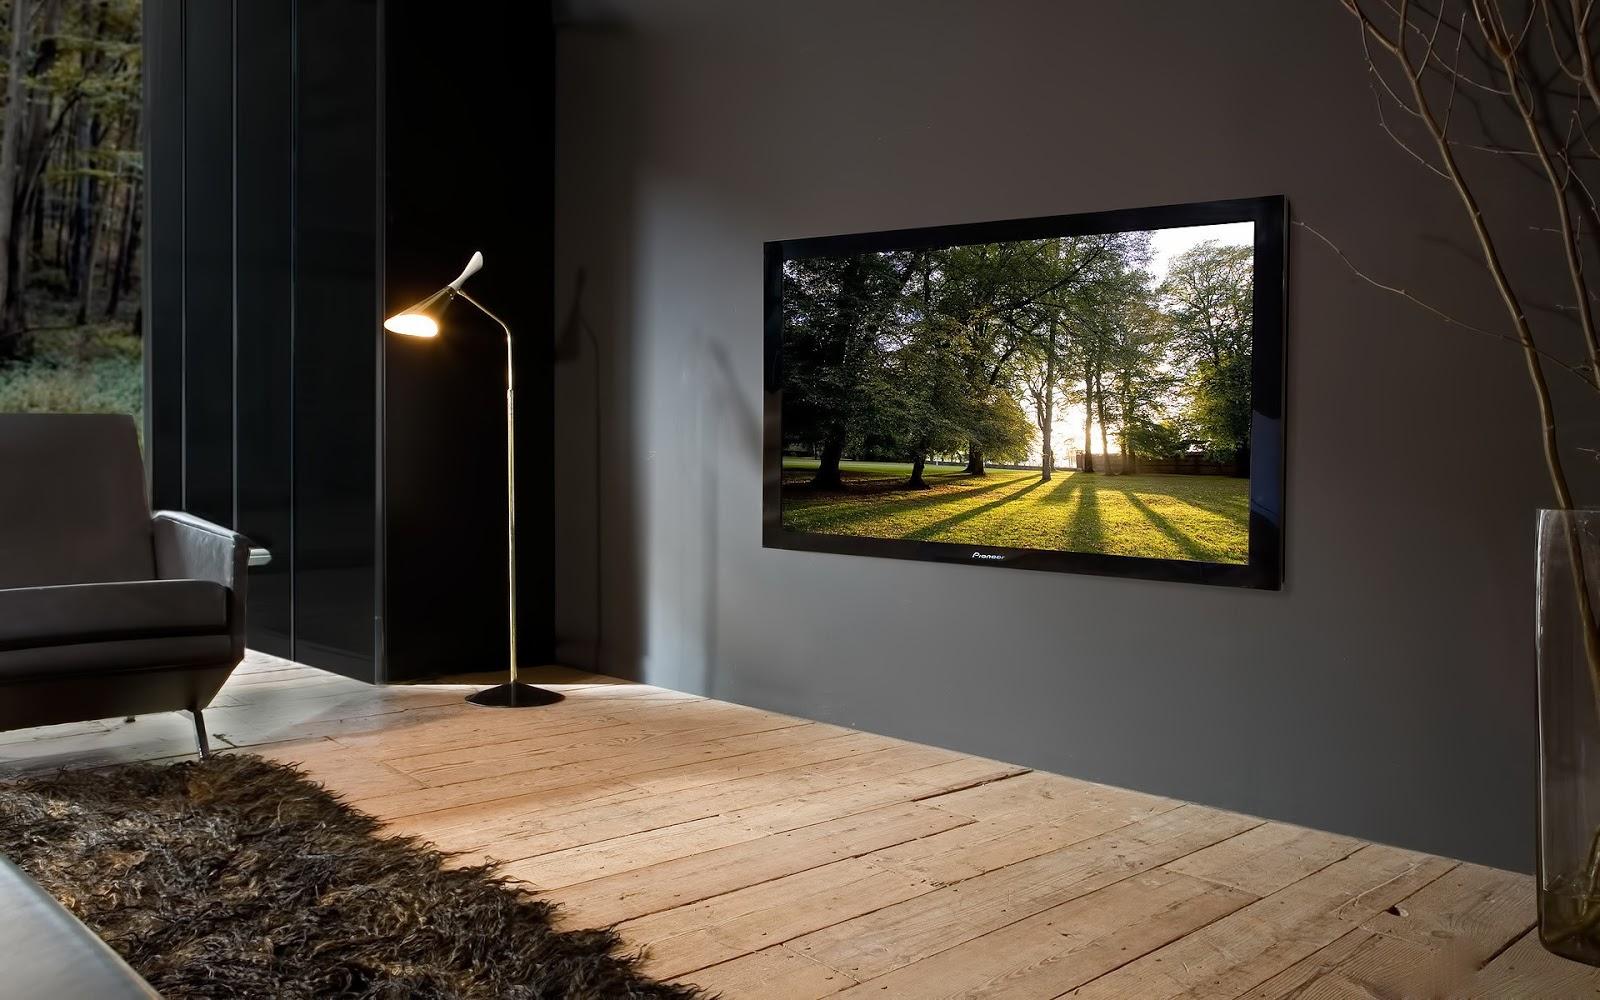 interior design hd wallpapers. Black Bedroom Furniture Sets. Home Design Ideas